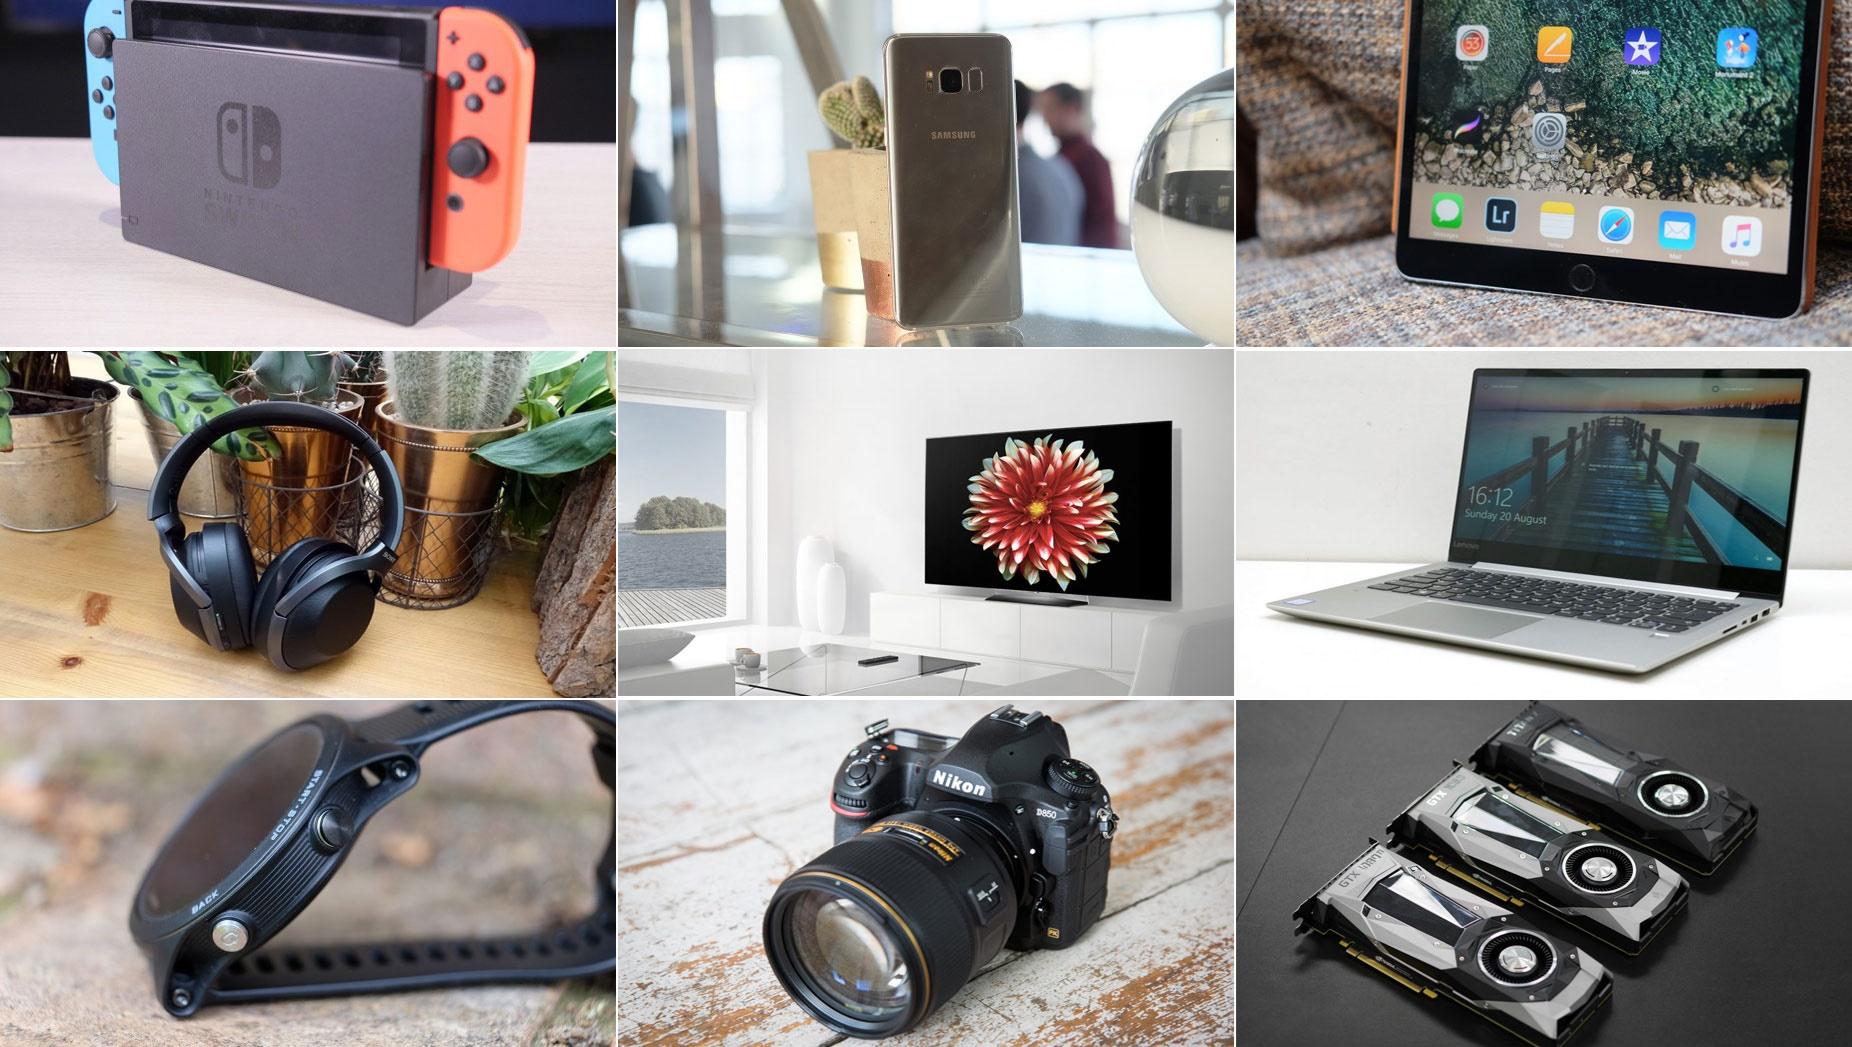 بهترین لپتاپ، تبلت، گوشی، تلویزیون، دوربین، هدفون و پهپاد ۲۰۱۷ را بشناسید